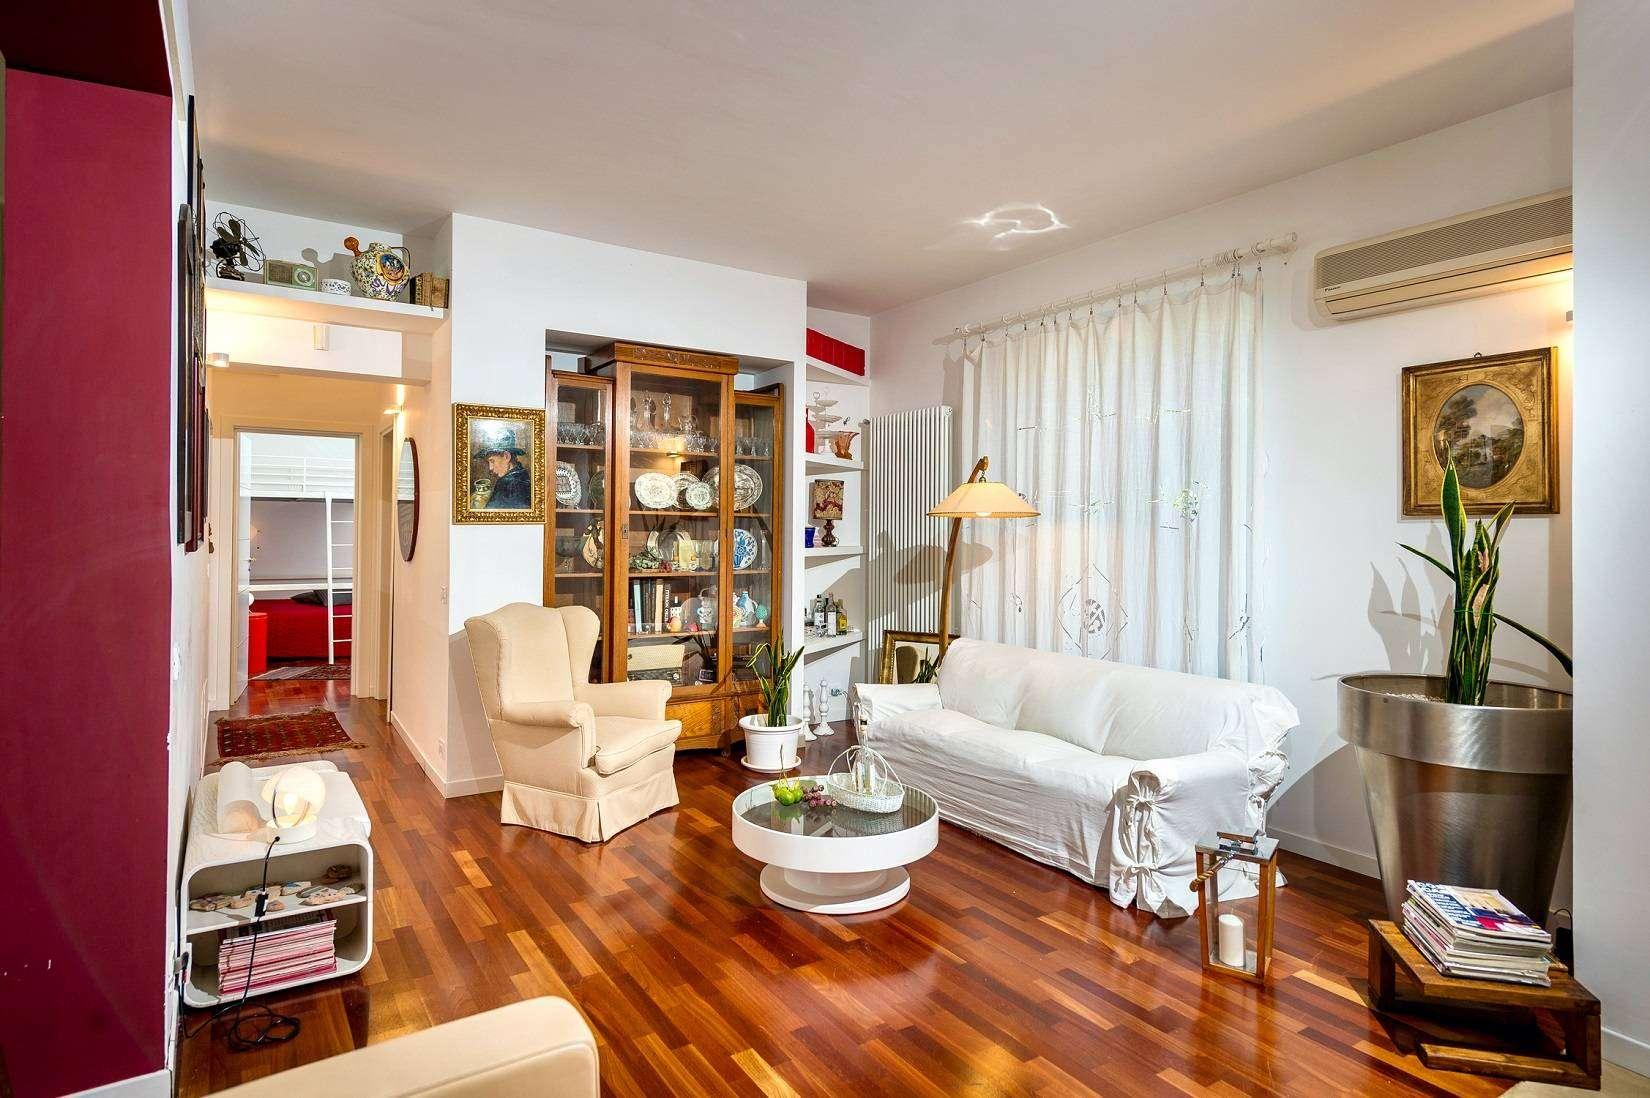 5 Dei Mori living room